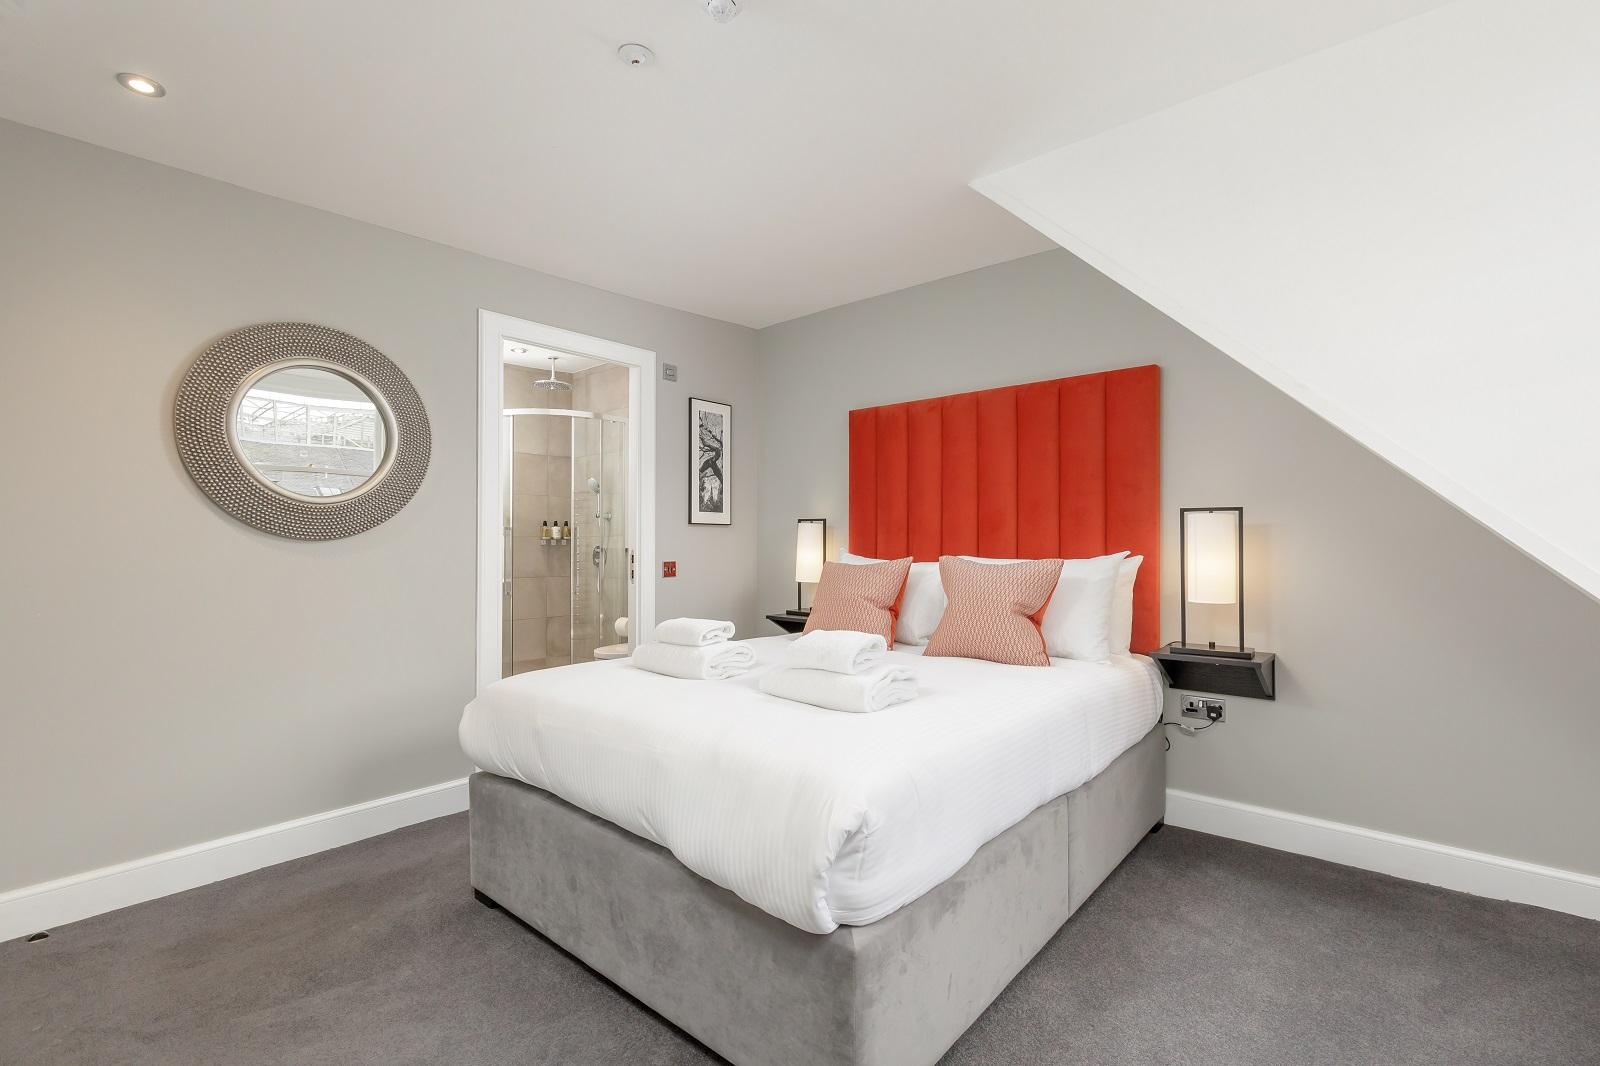 King size bed at Hanover Serviced Apartments